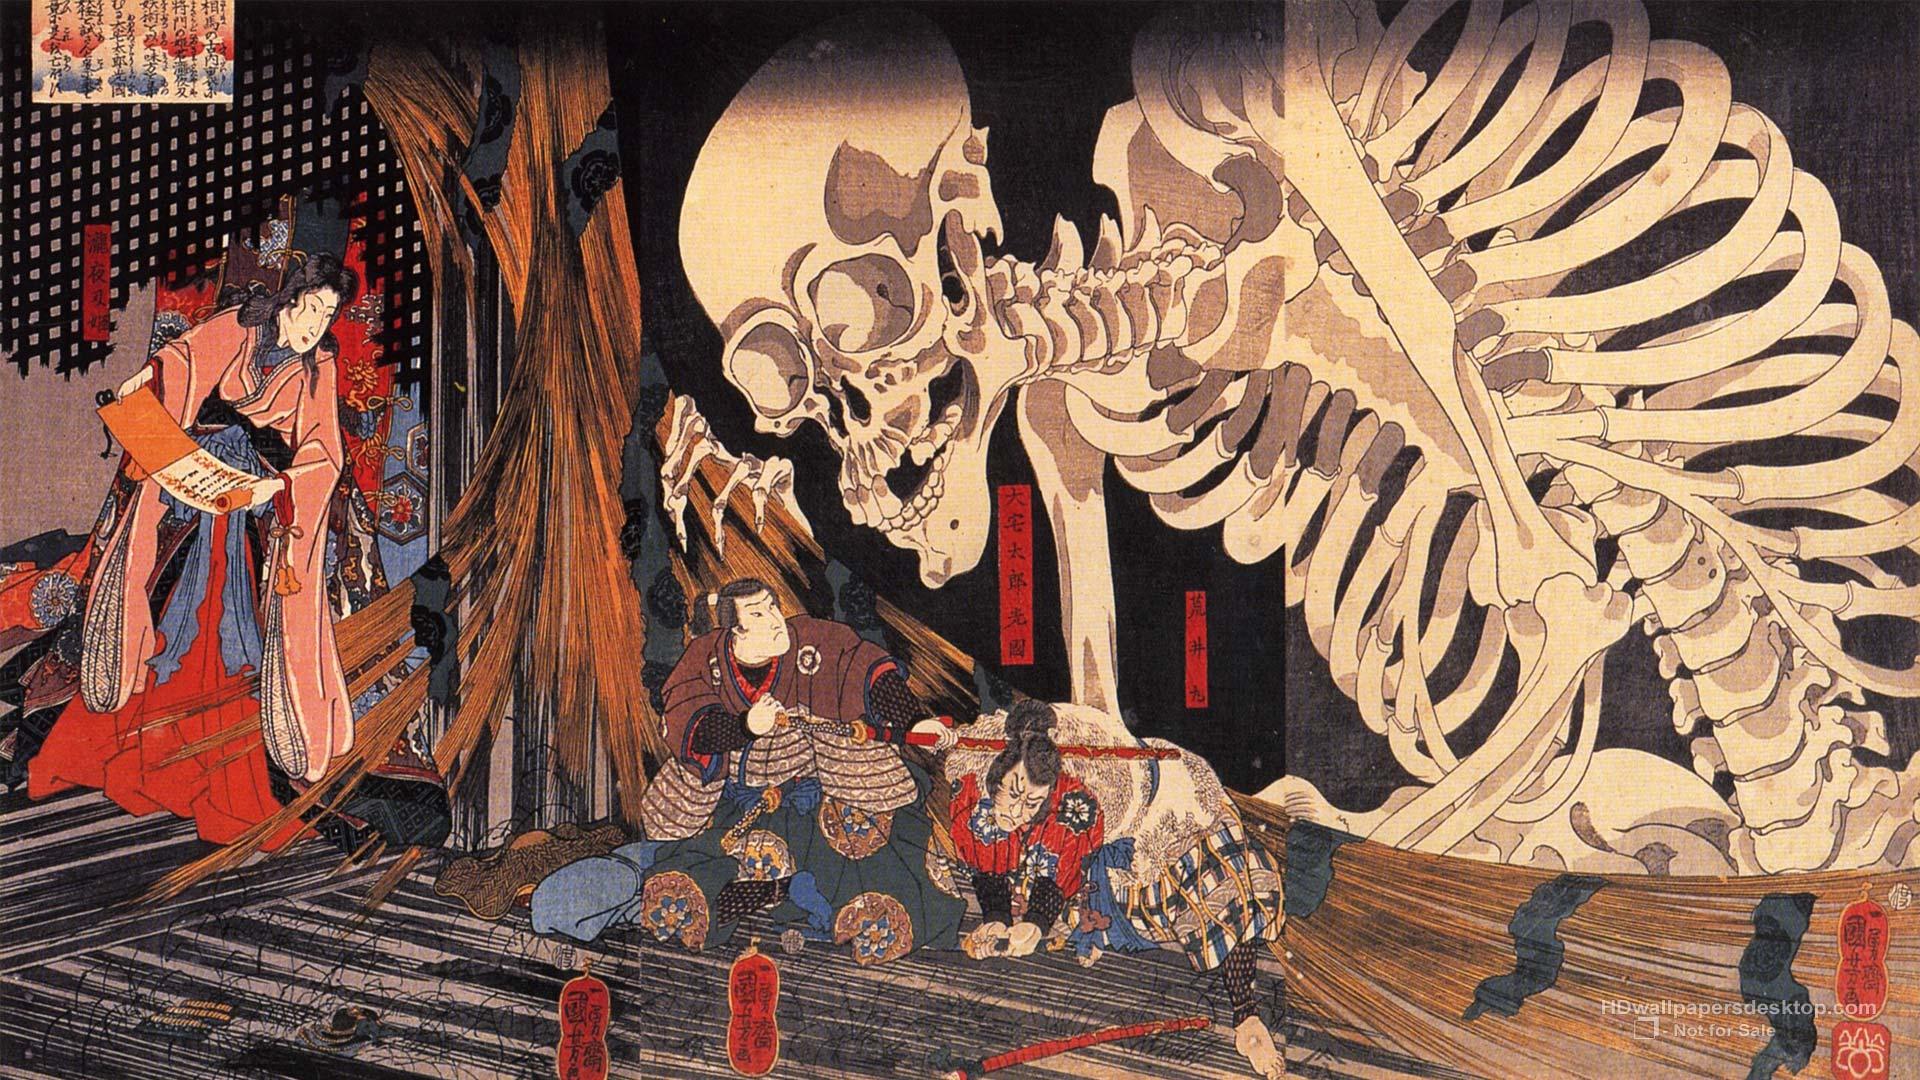 Japanese Art Wallpaper 1920x1080 43813